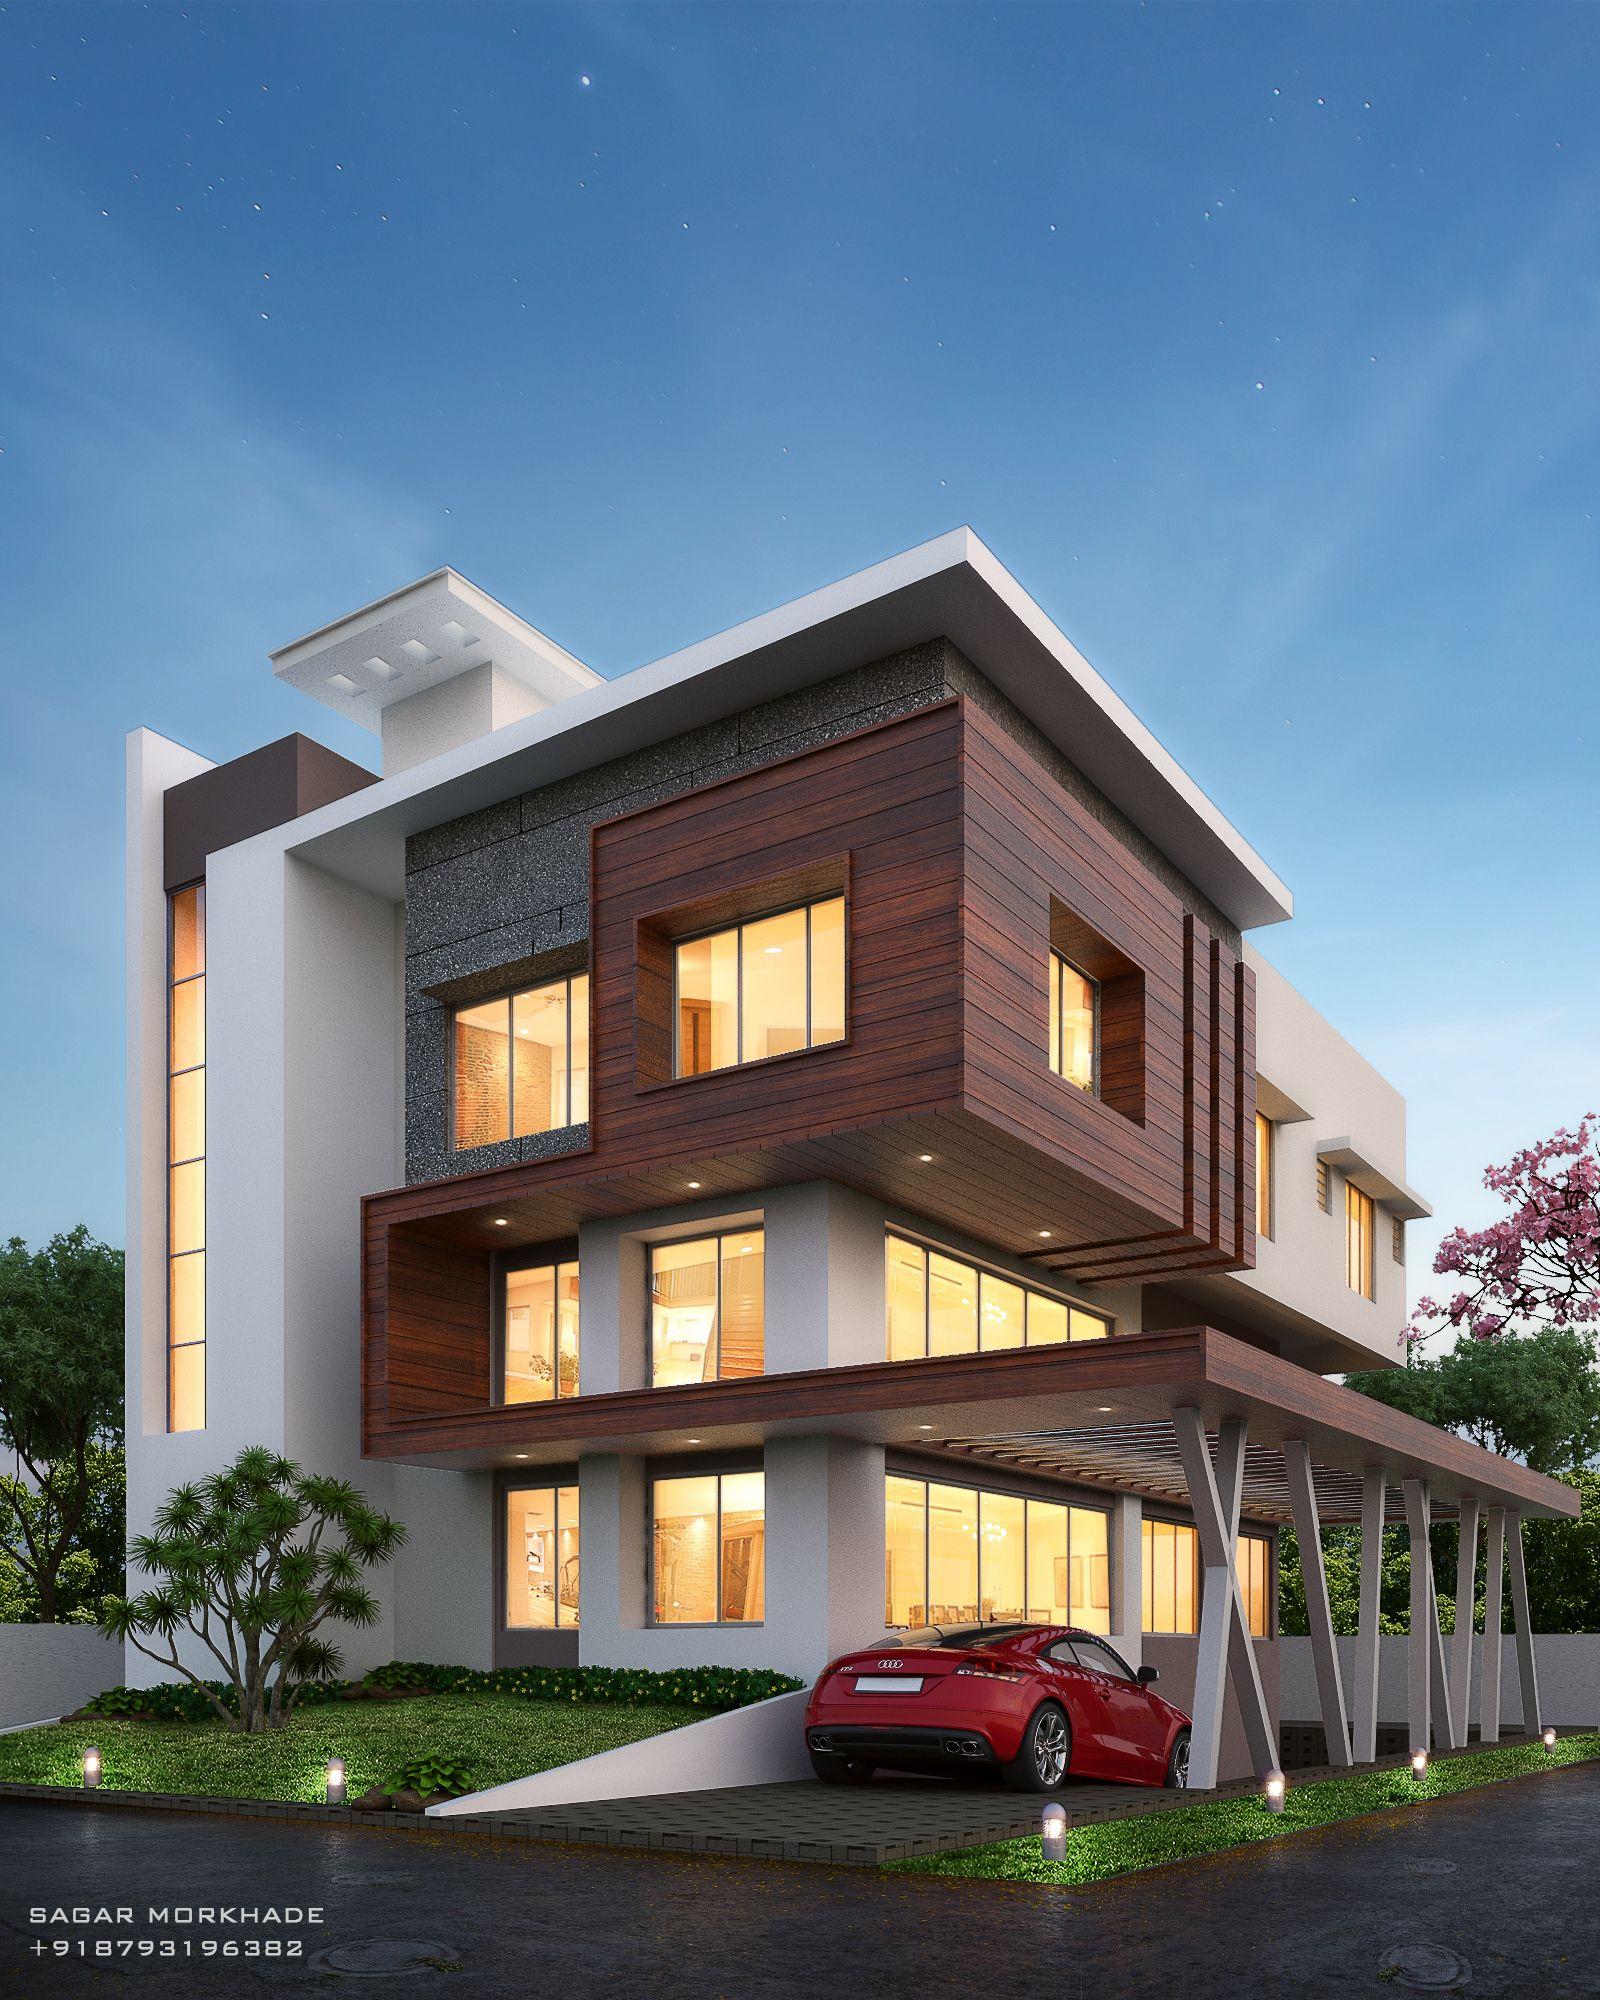 Modern House Exterior Elevation By Sagar Morkhade Vdraw